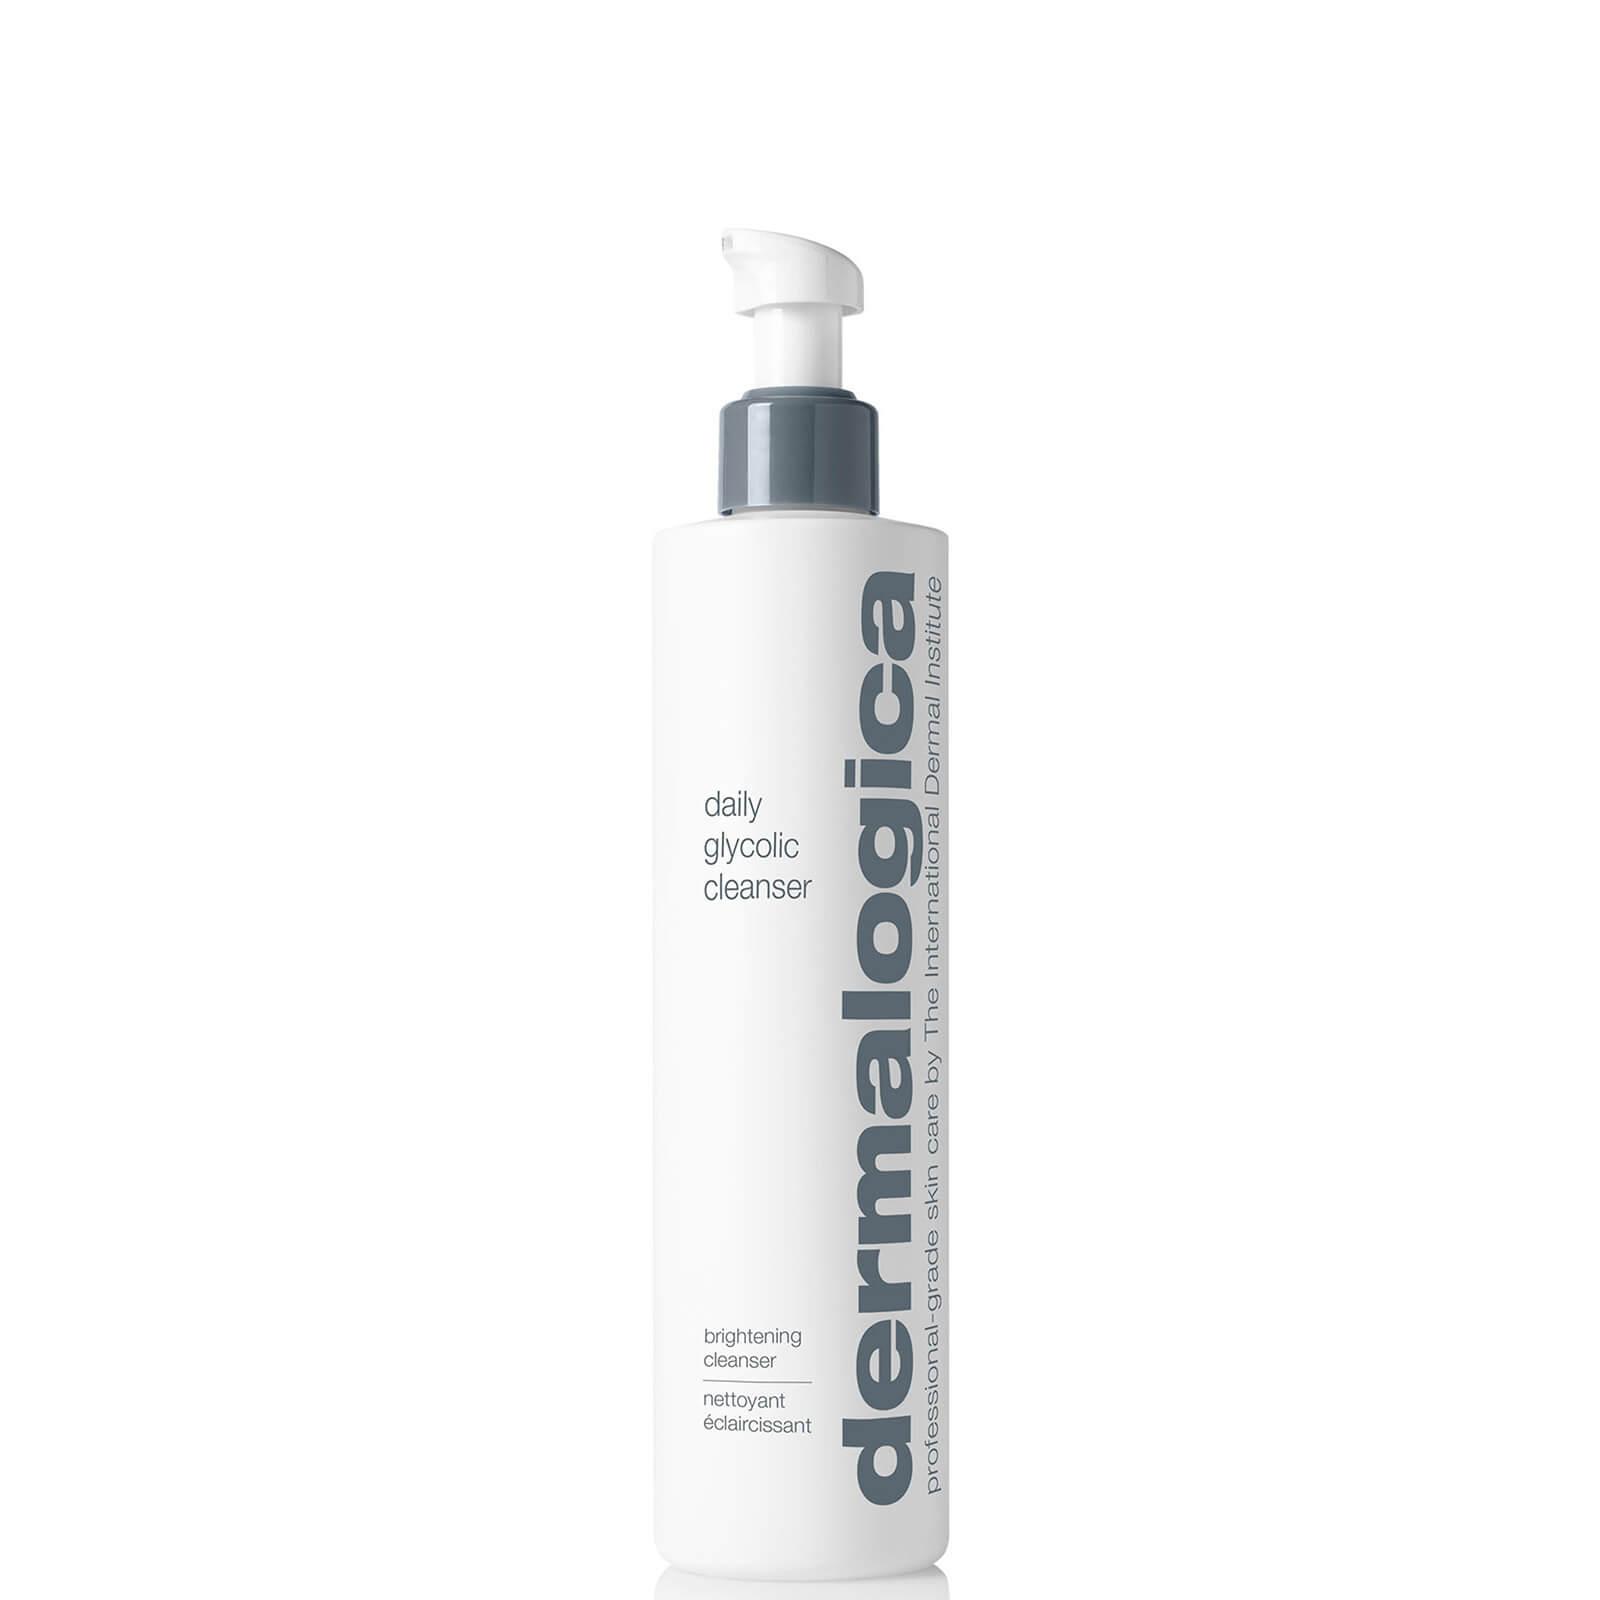 Купить Dermalogica Daily Glycolic Cleanser 295ml